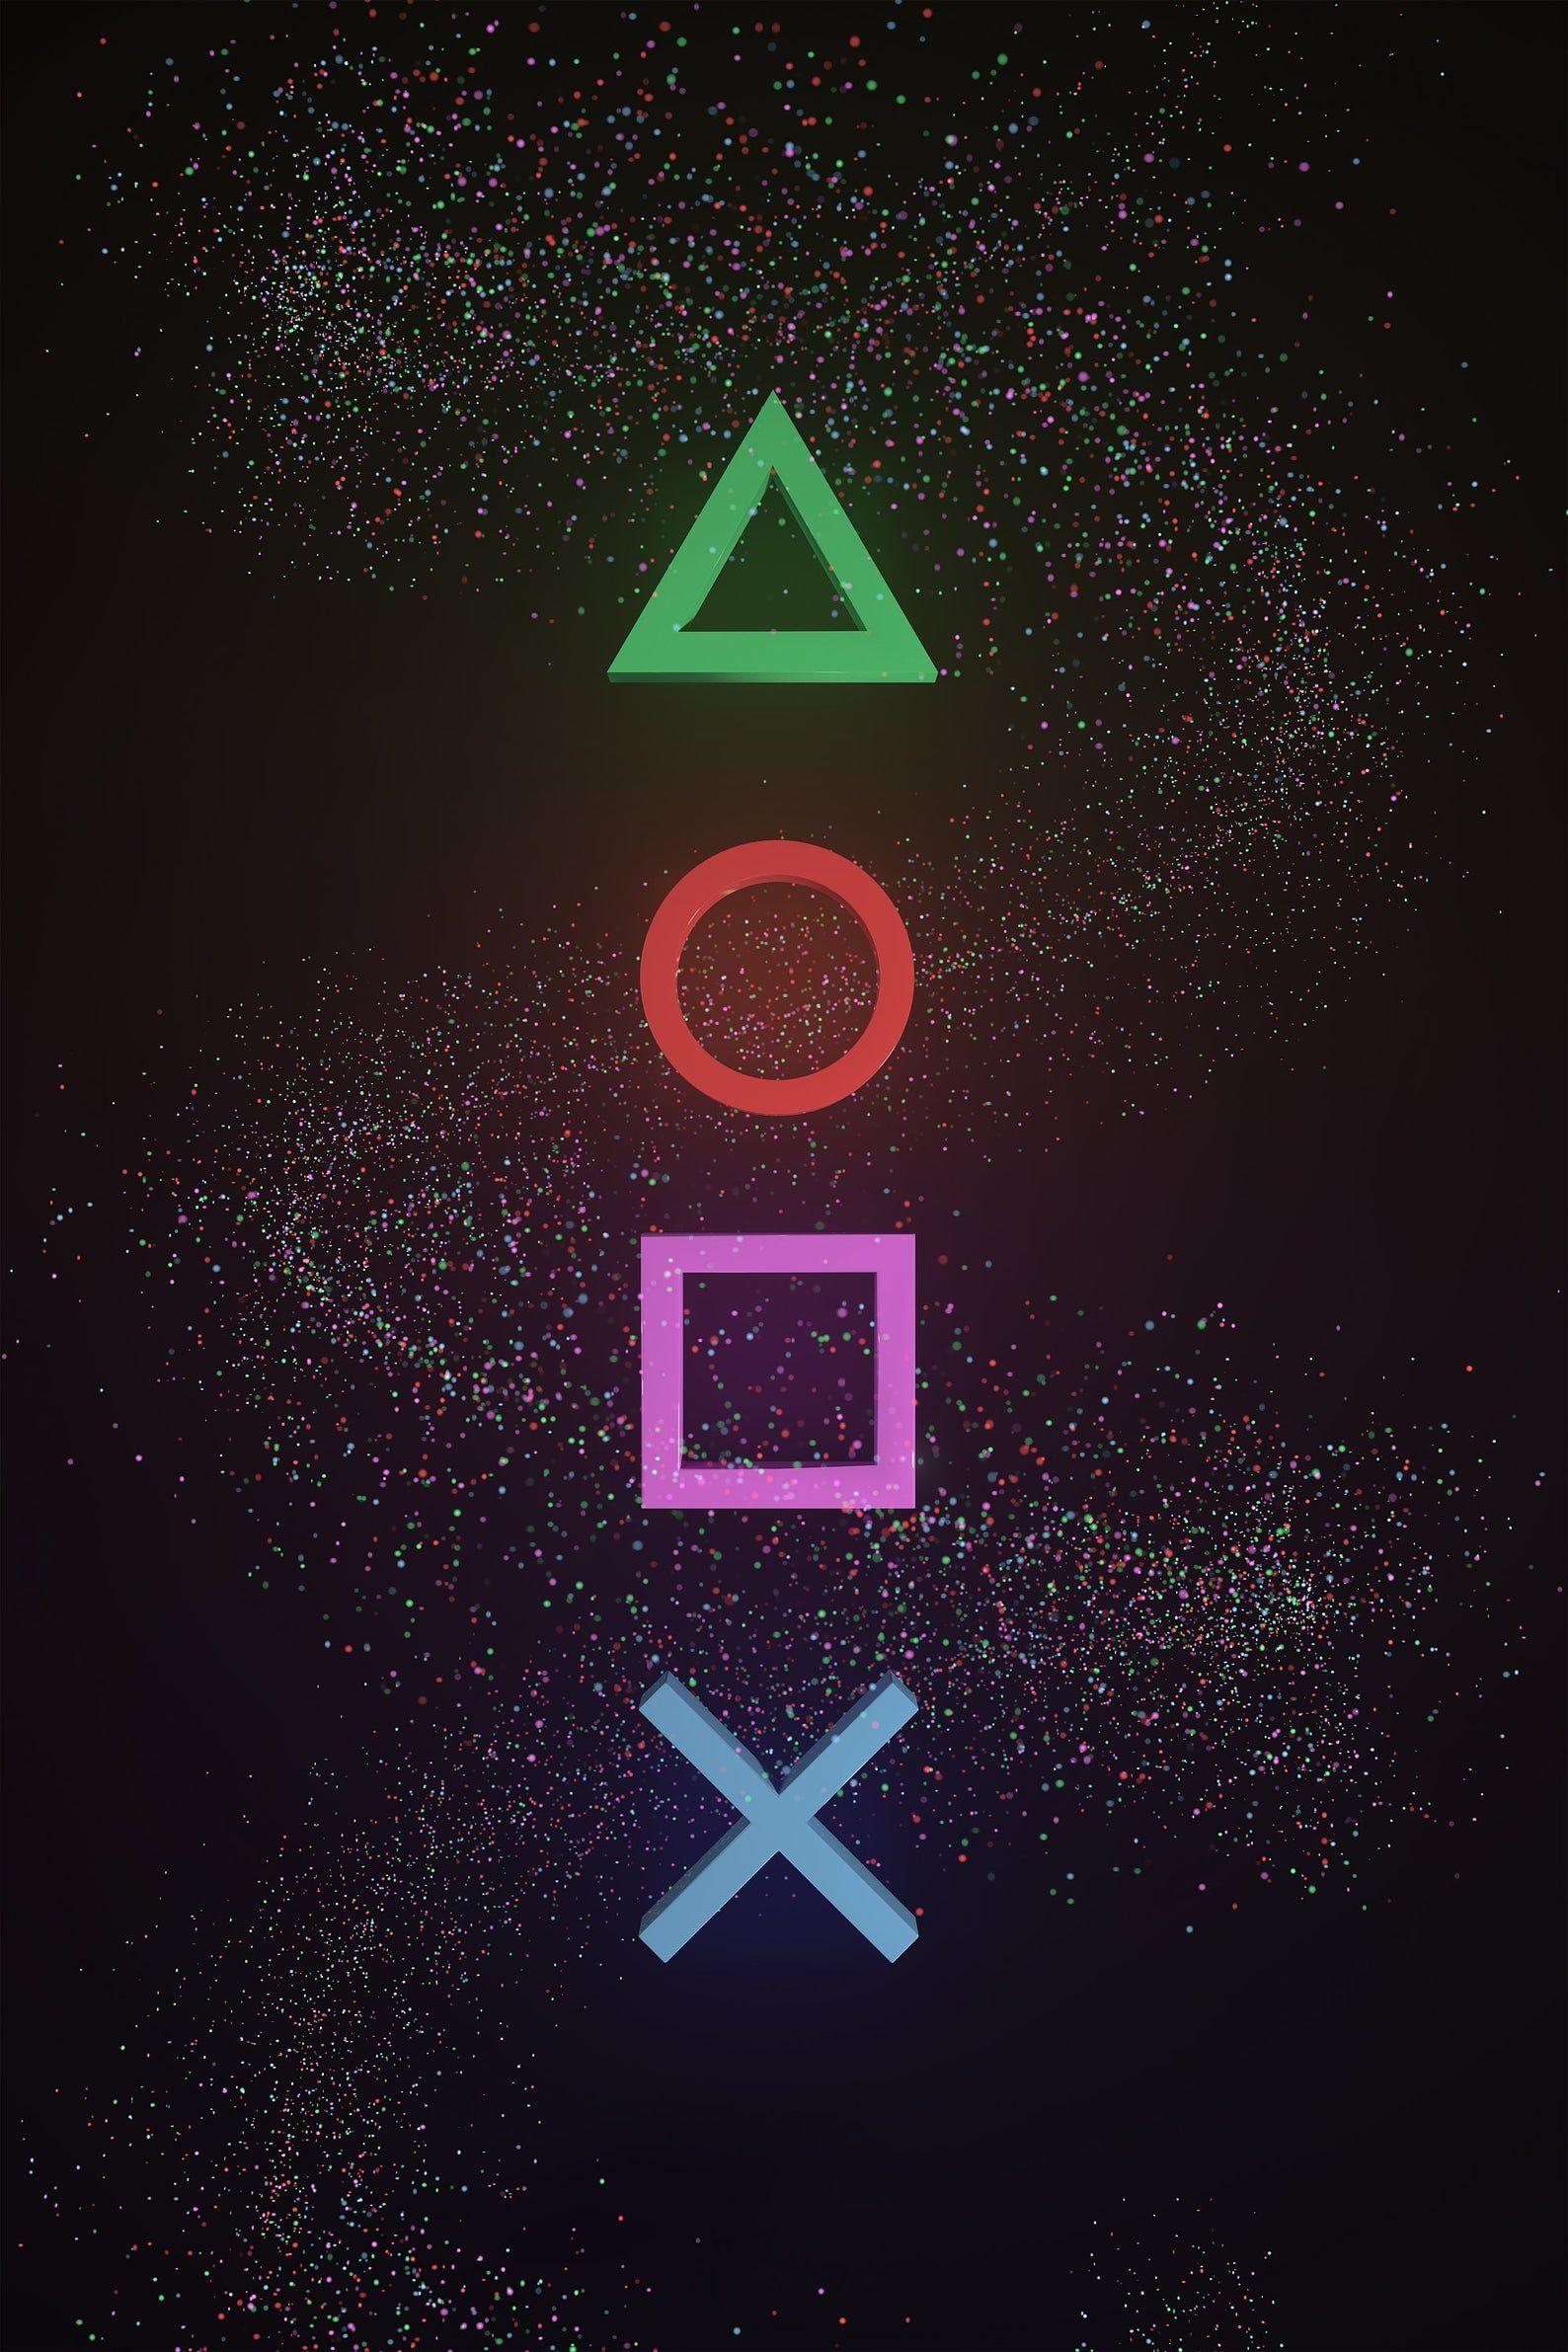 Playstation Inspired Art, PRINT, Poster, Symbols, Gaming